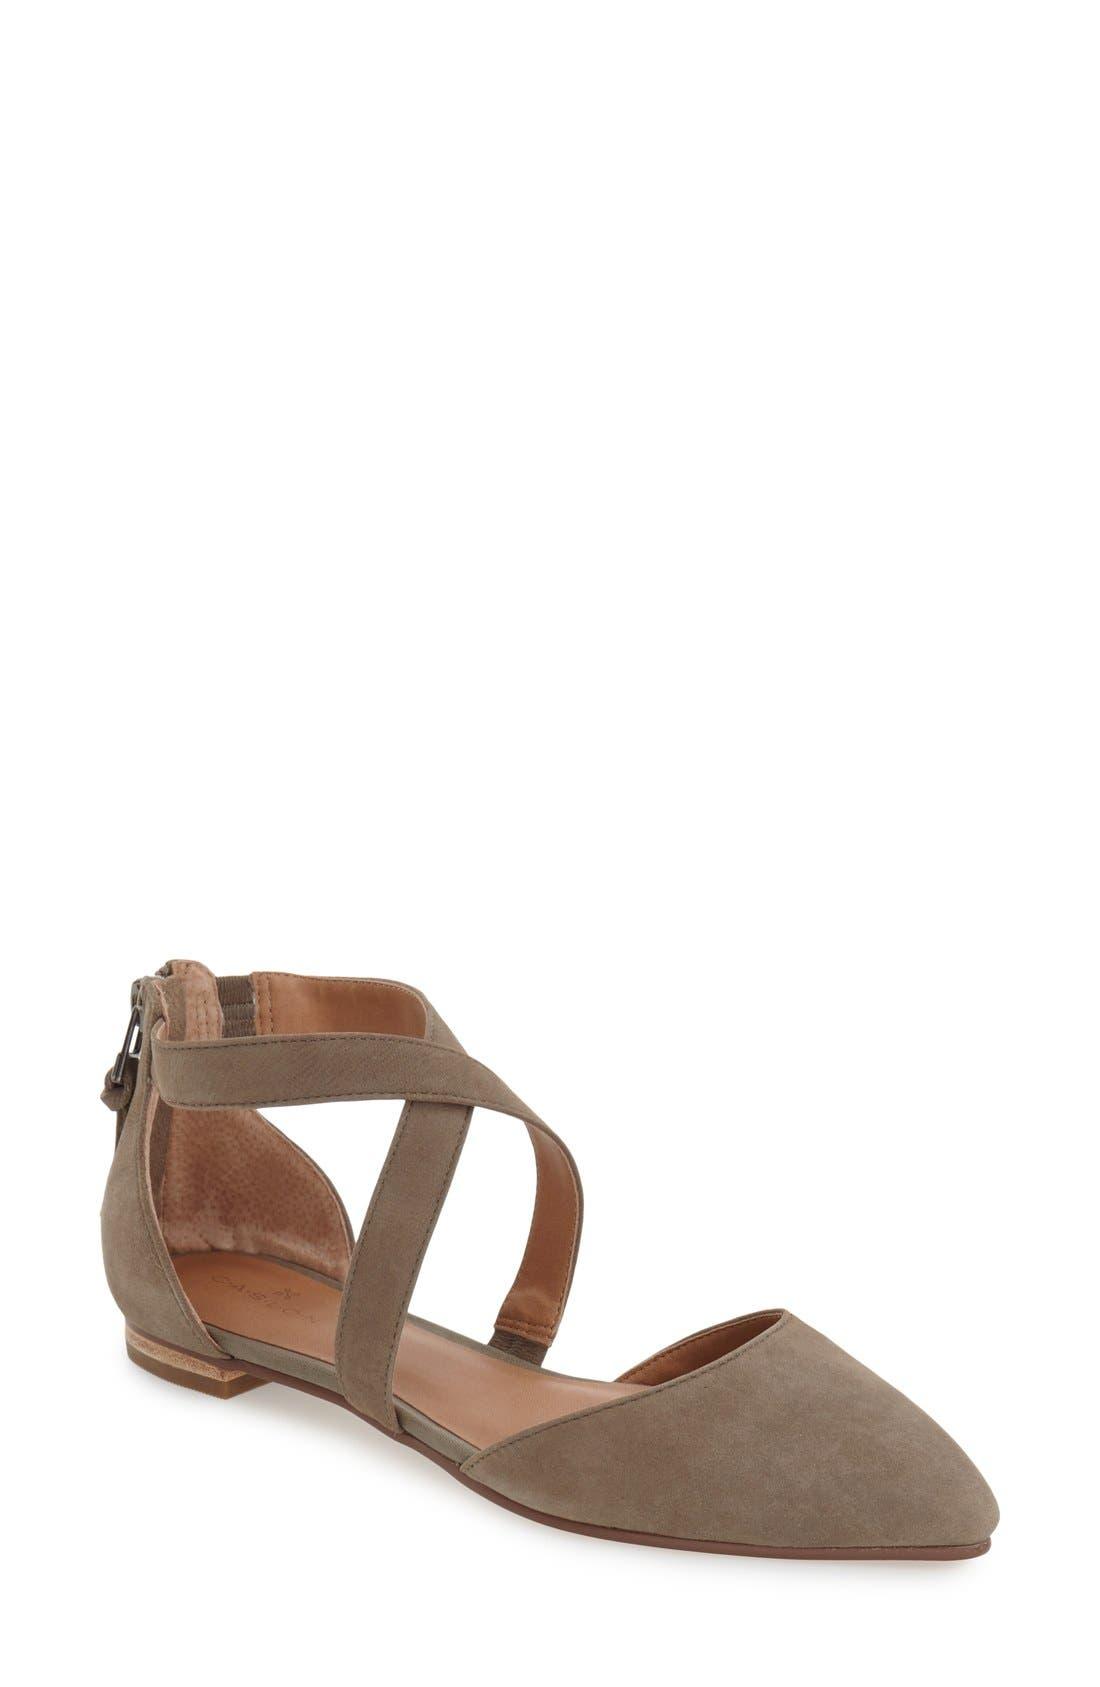 Main Image - Caslon® 'Aubry' Pointy Toe Flat (Women)